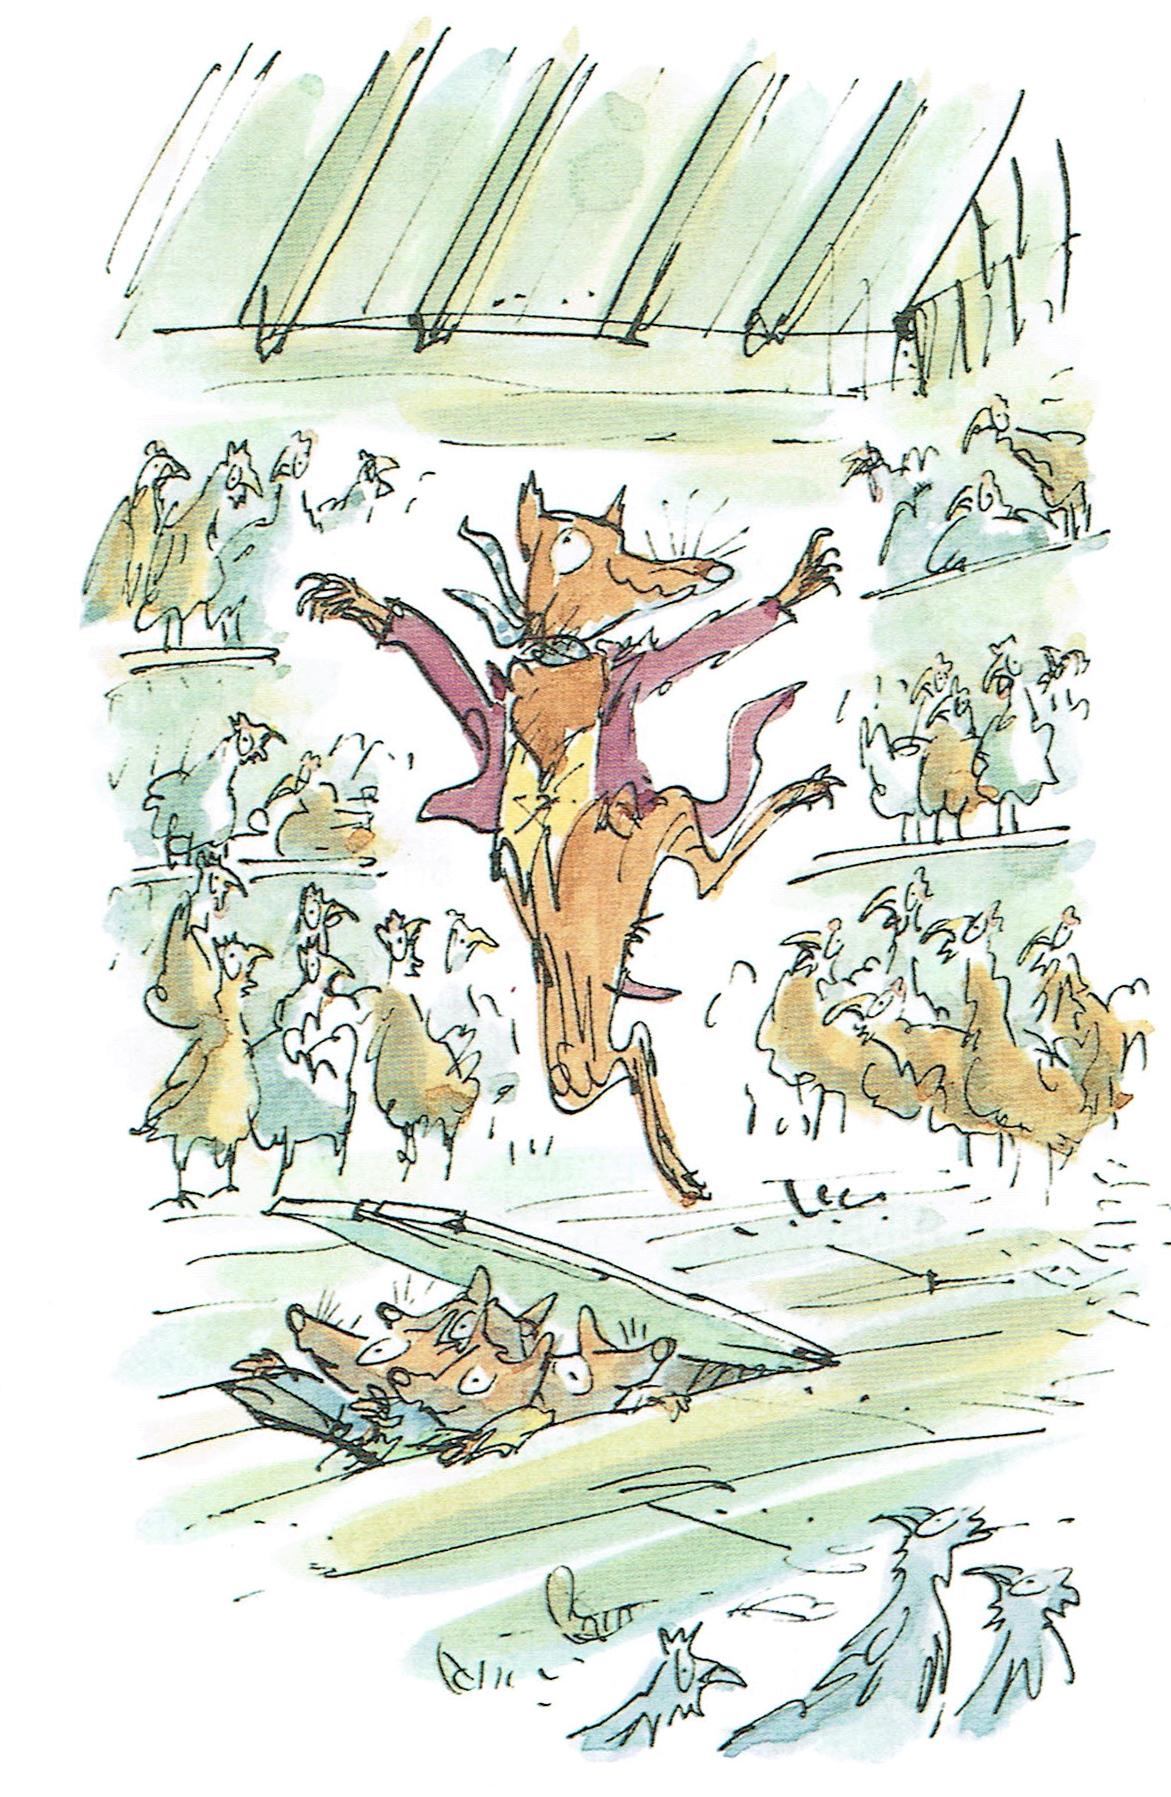 Fantastique Maître Renard de Roald Dahl – CM1/CM2